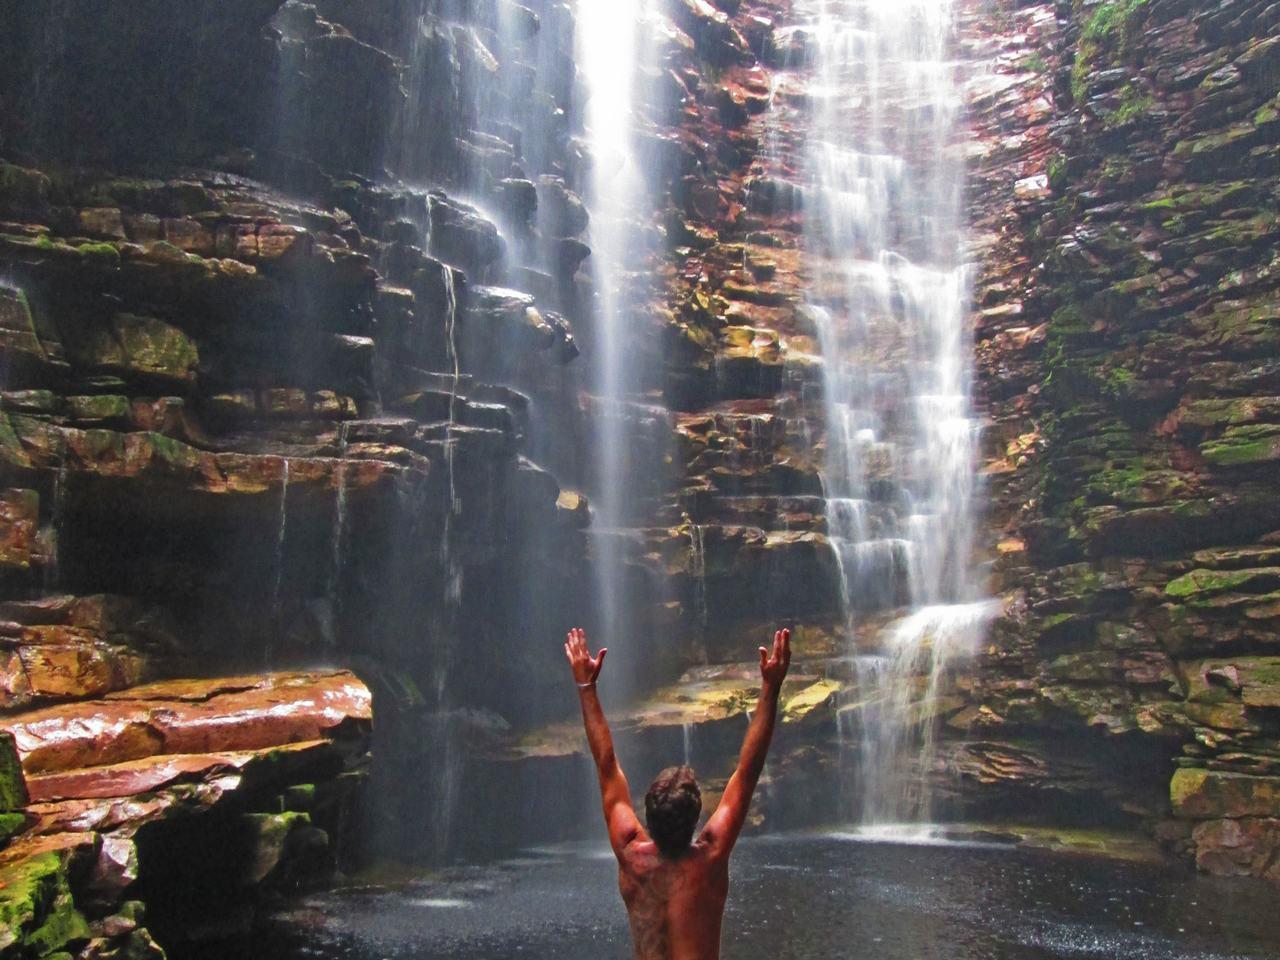 Cachoeira da Mixila, Canyon, Chapada Diamntina, Bahia, Brazil (8)